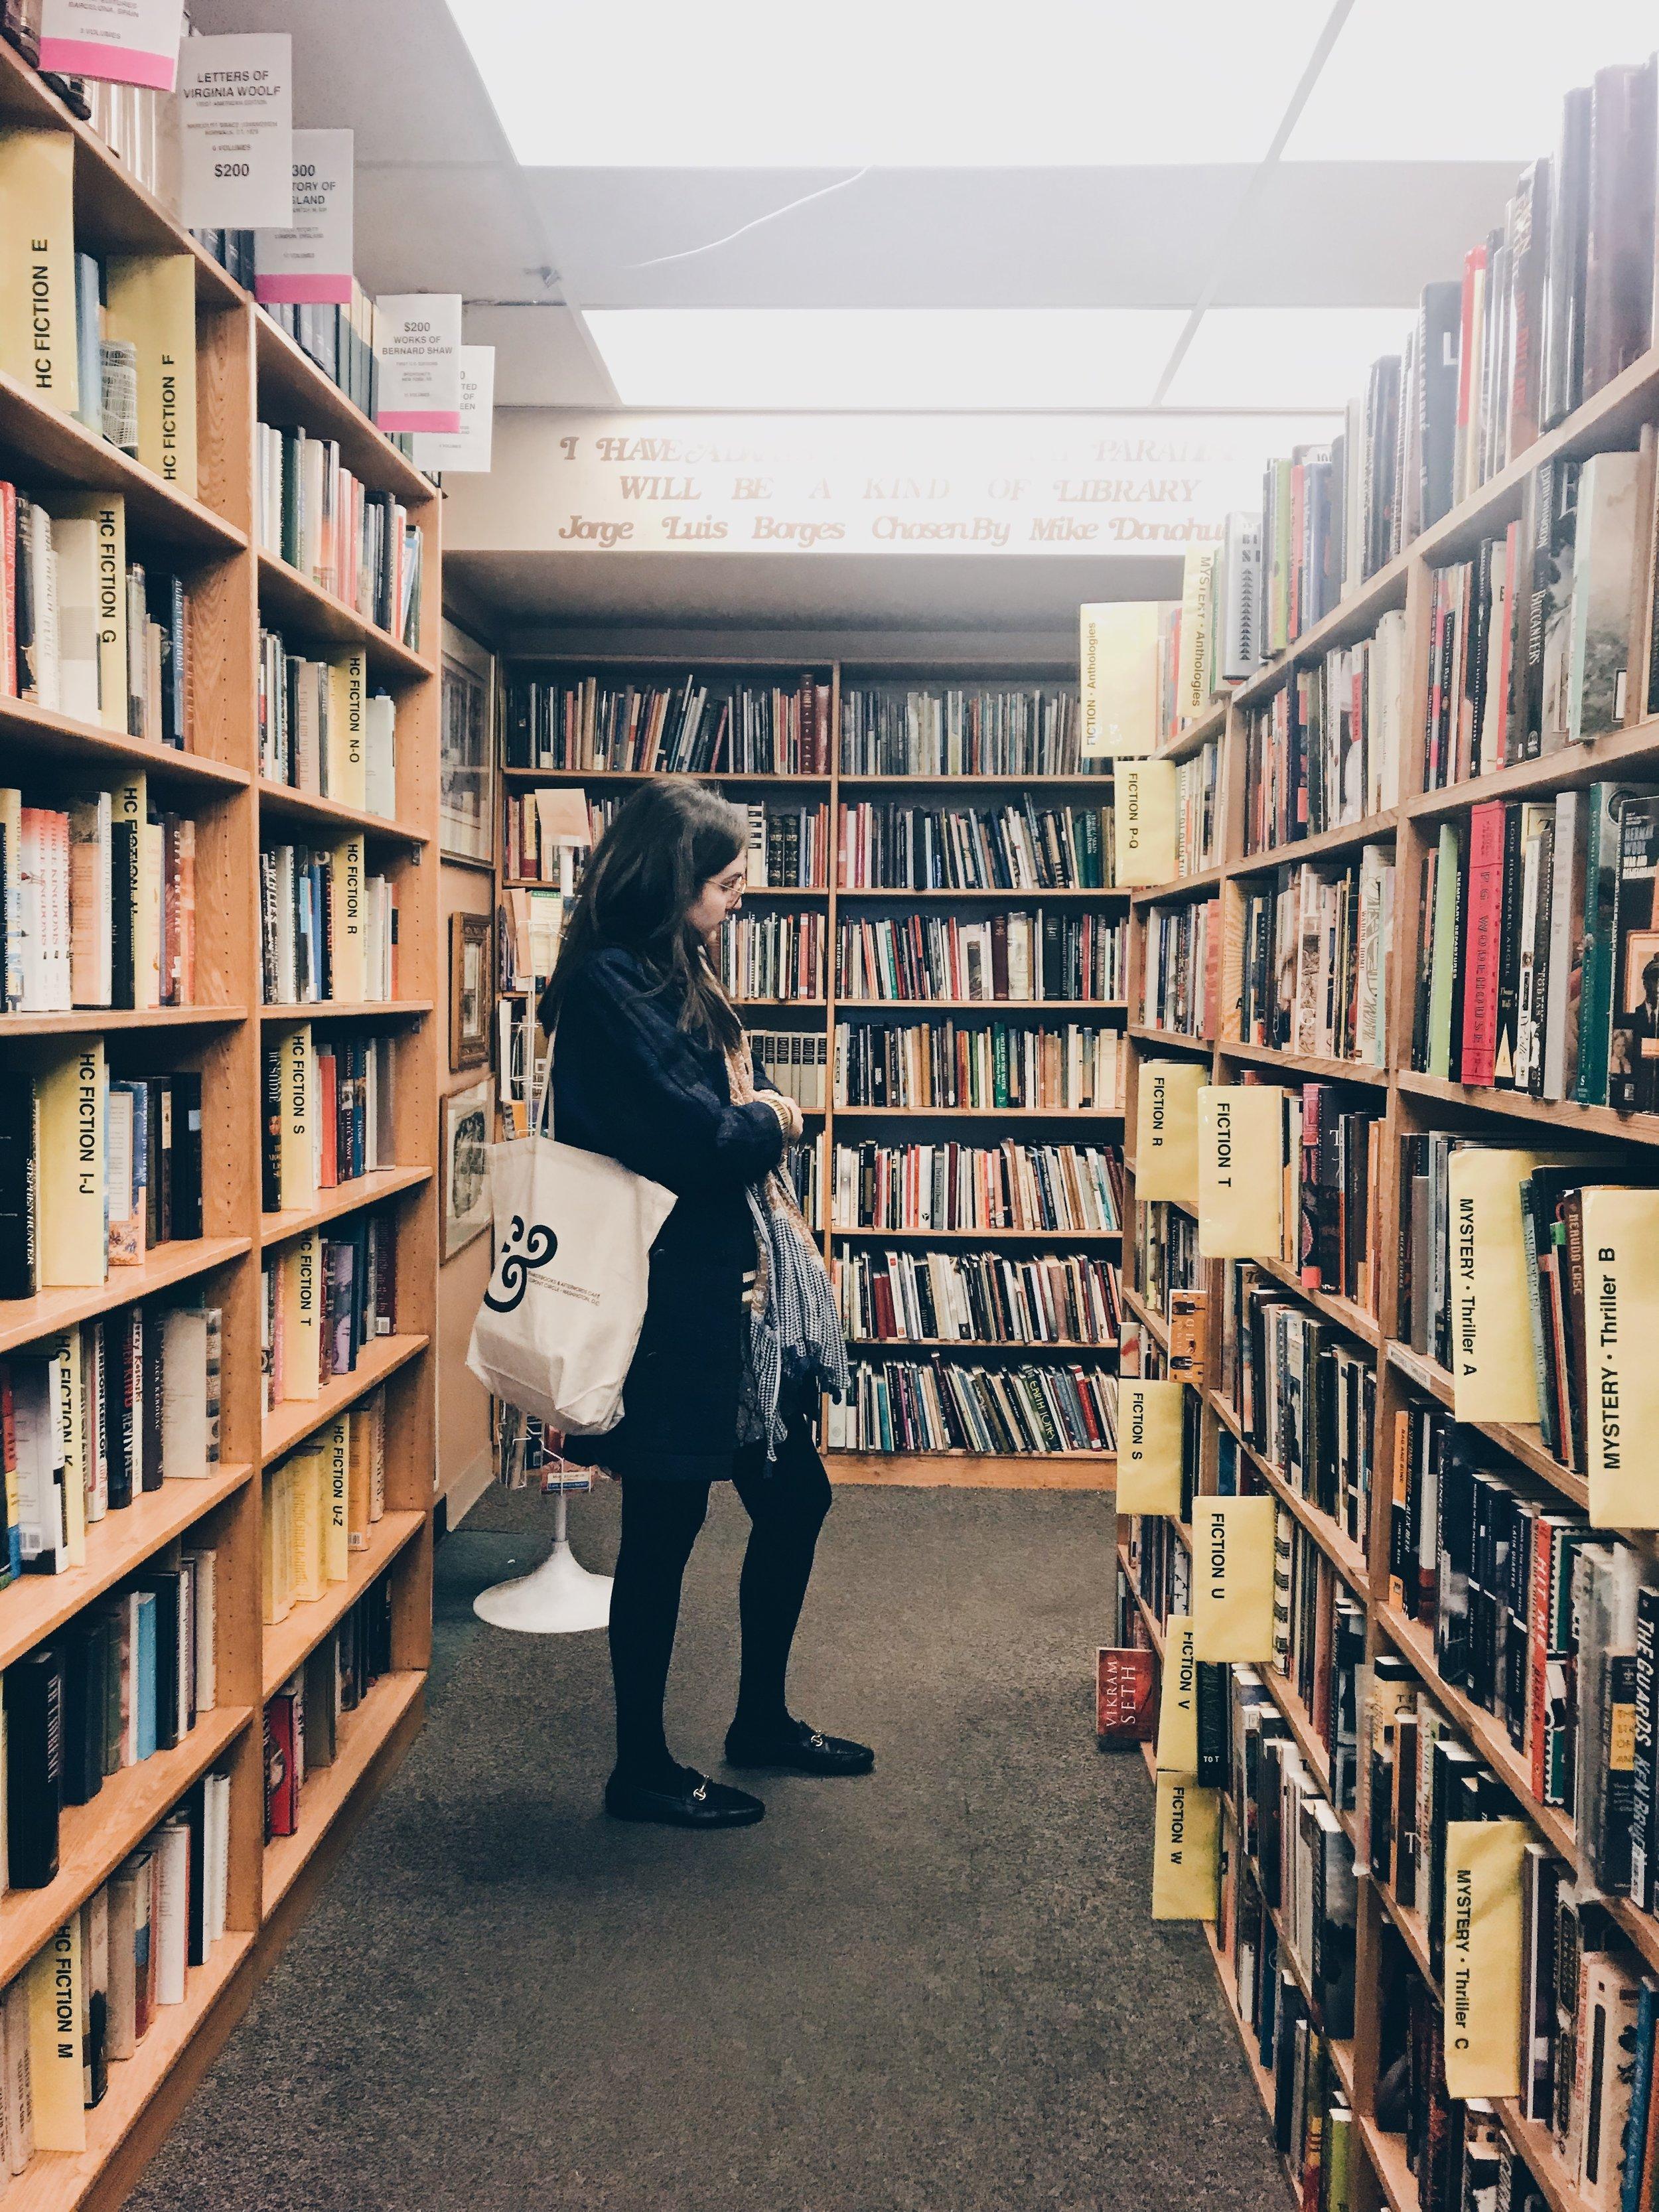 Second Story Books bookshop Washington DC The Attic on Eighth 2.JPG